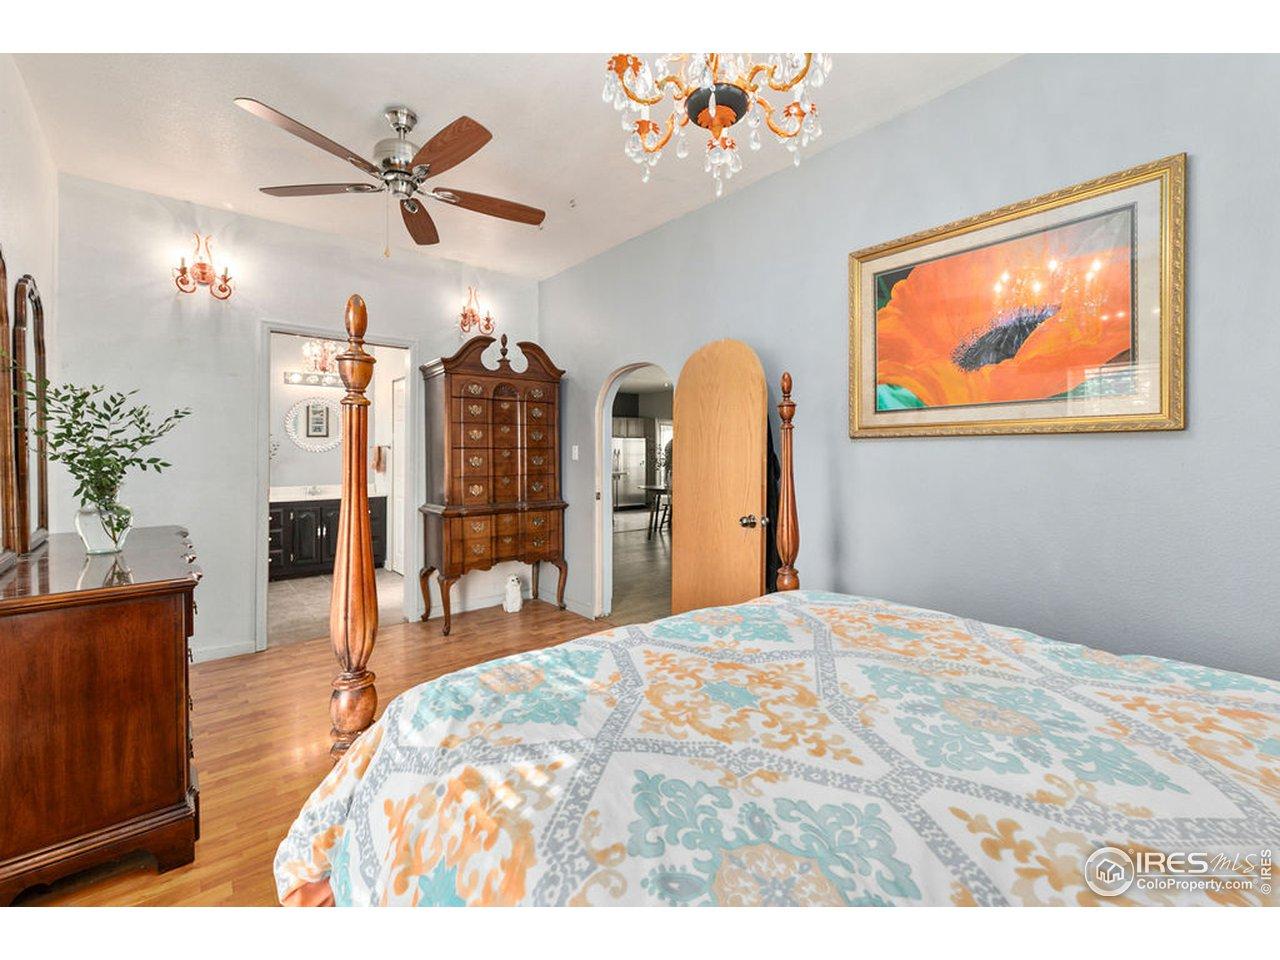 Primary suite with vintage arched doorway